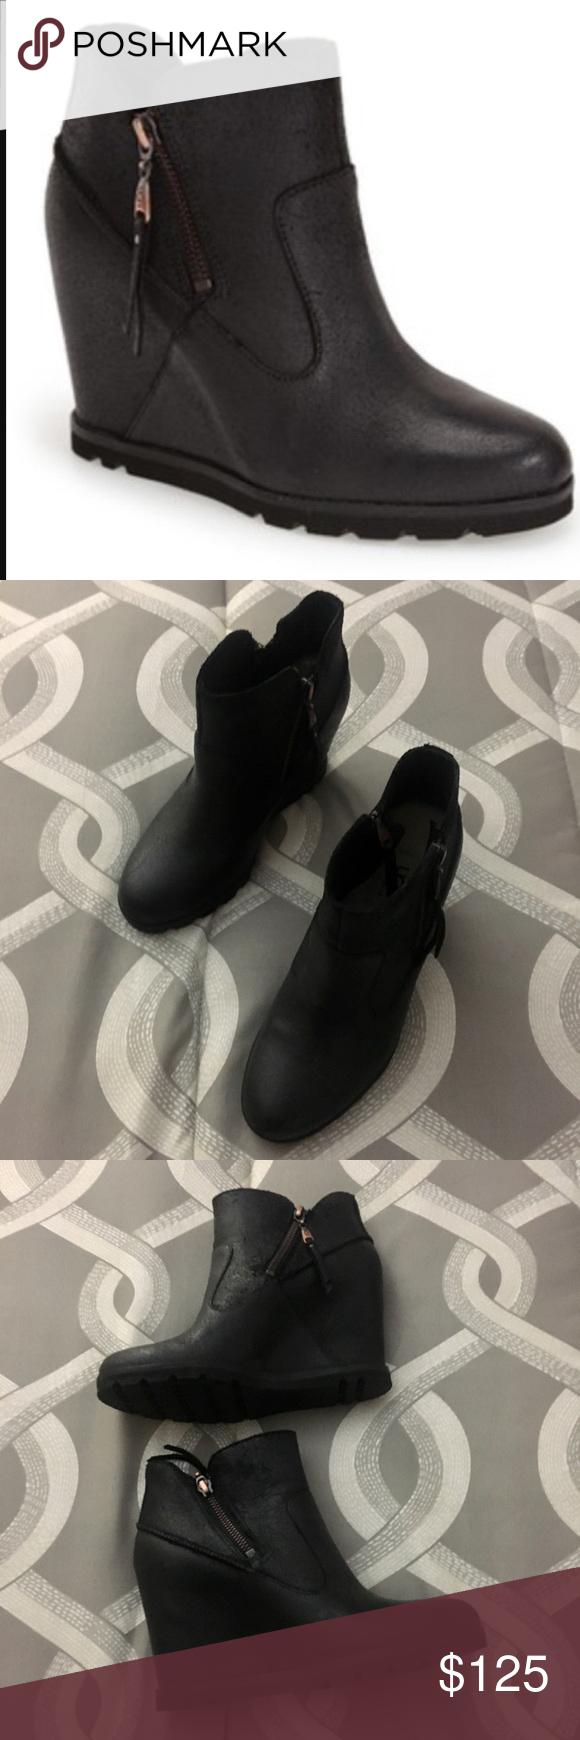 "3da5eb4e3e1 UGG ""Myrna"" Wedge Ankle Boots UGG ""Myrna"" Wedge Ankle Boots. Black ..."